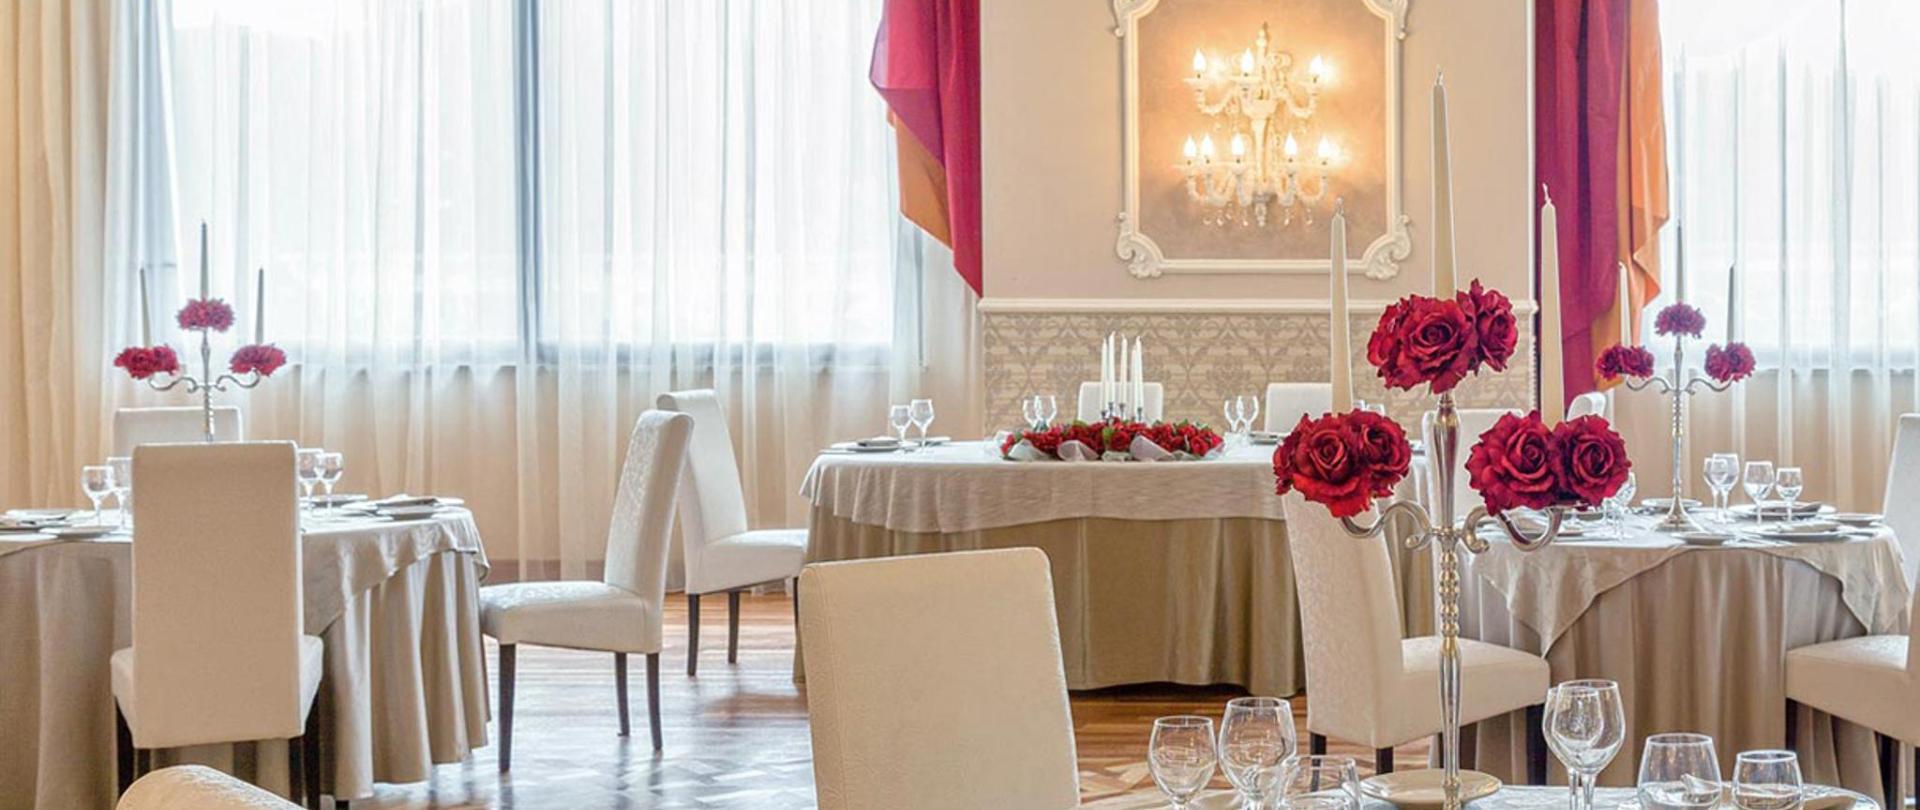 Virginia_Palace_Hotel_Spa_Centro_Benessere_Sala_cerimonia_Campania_Avellino.jpg